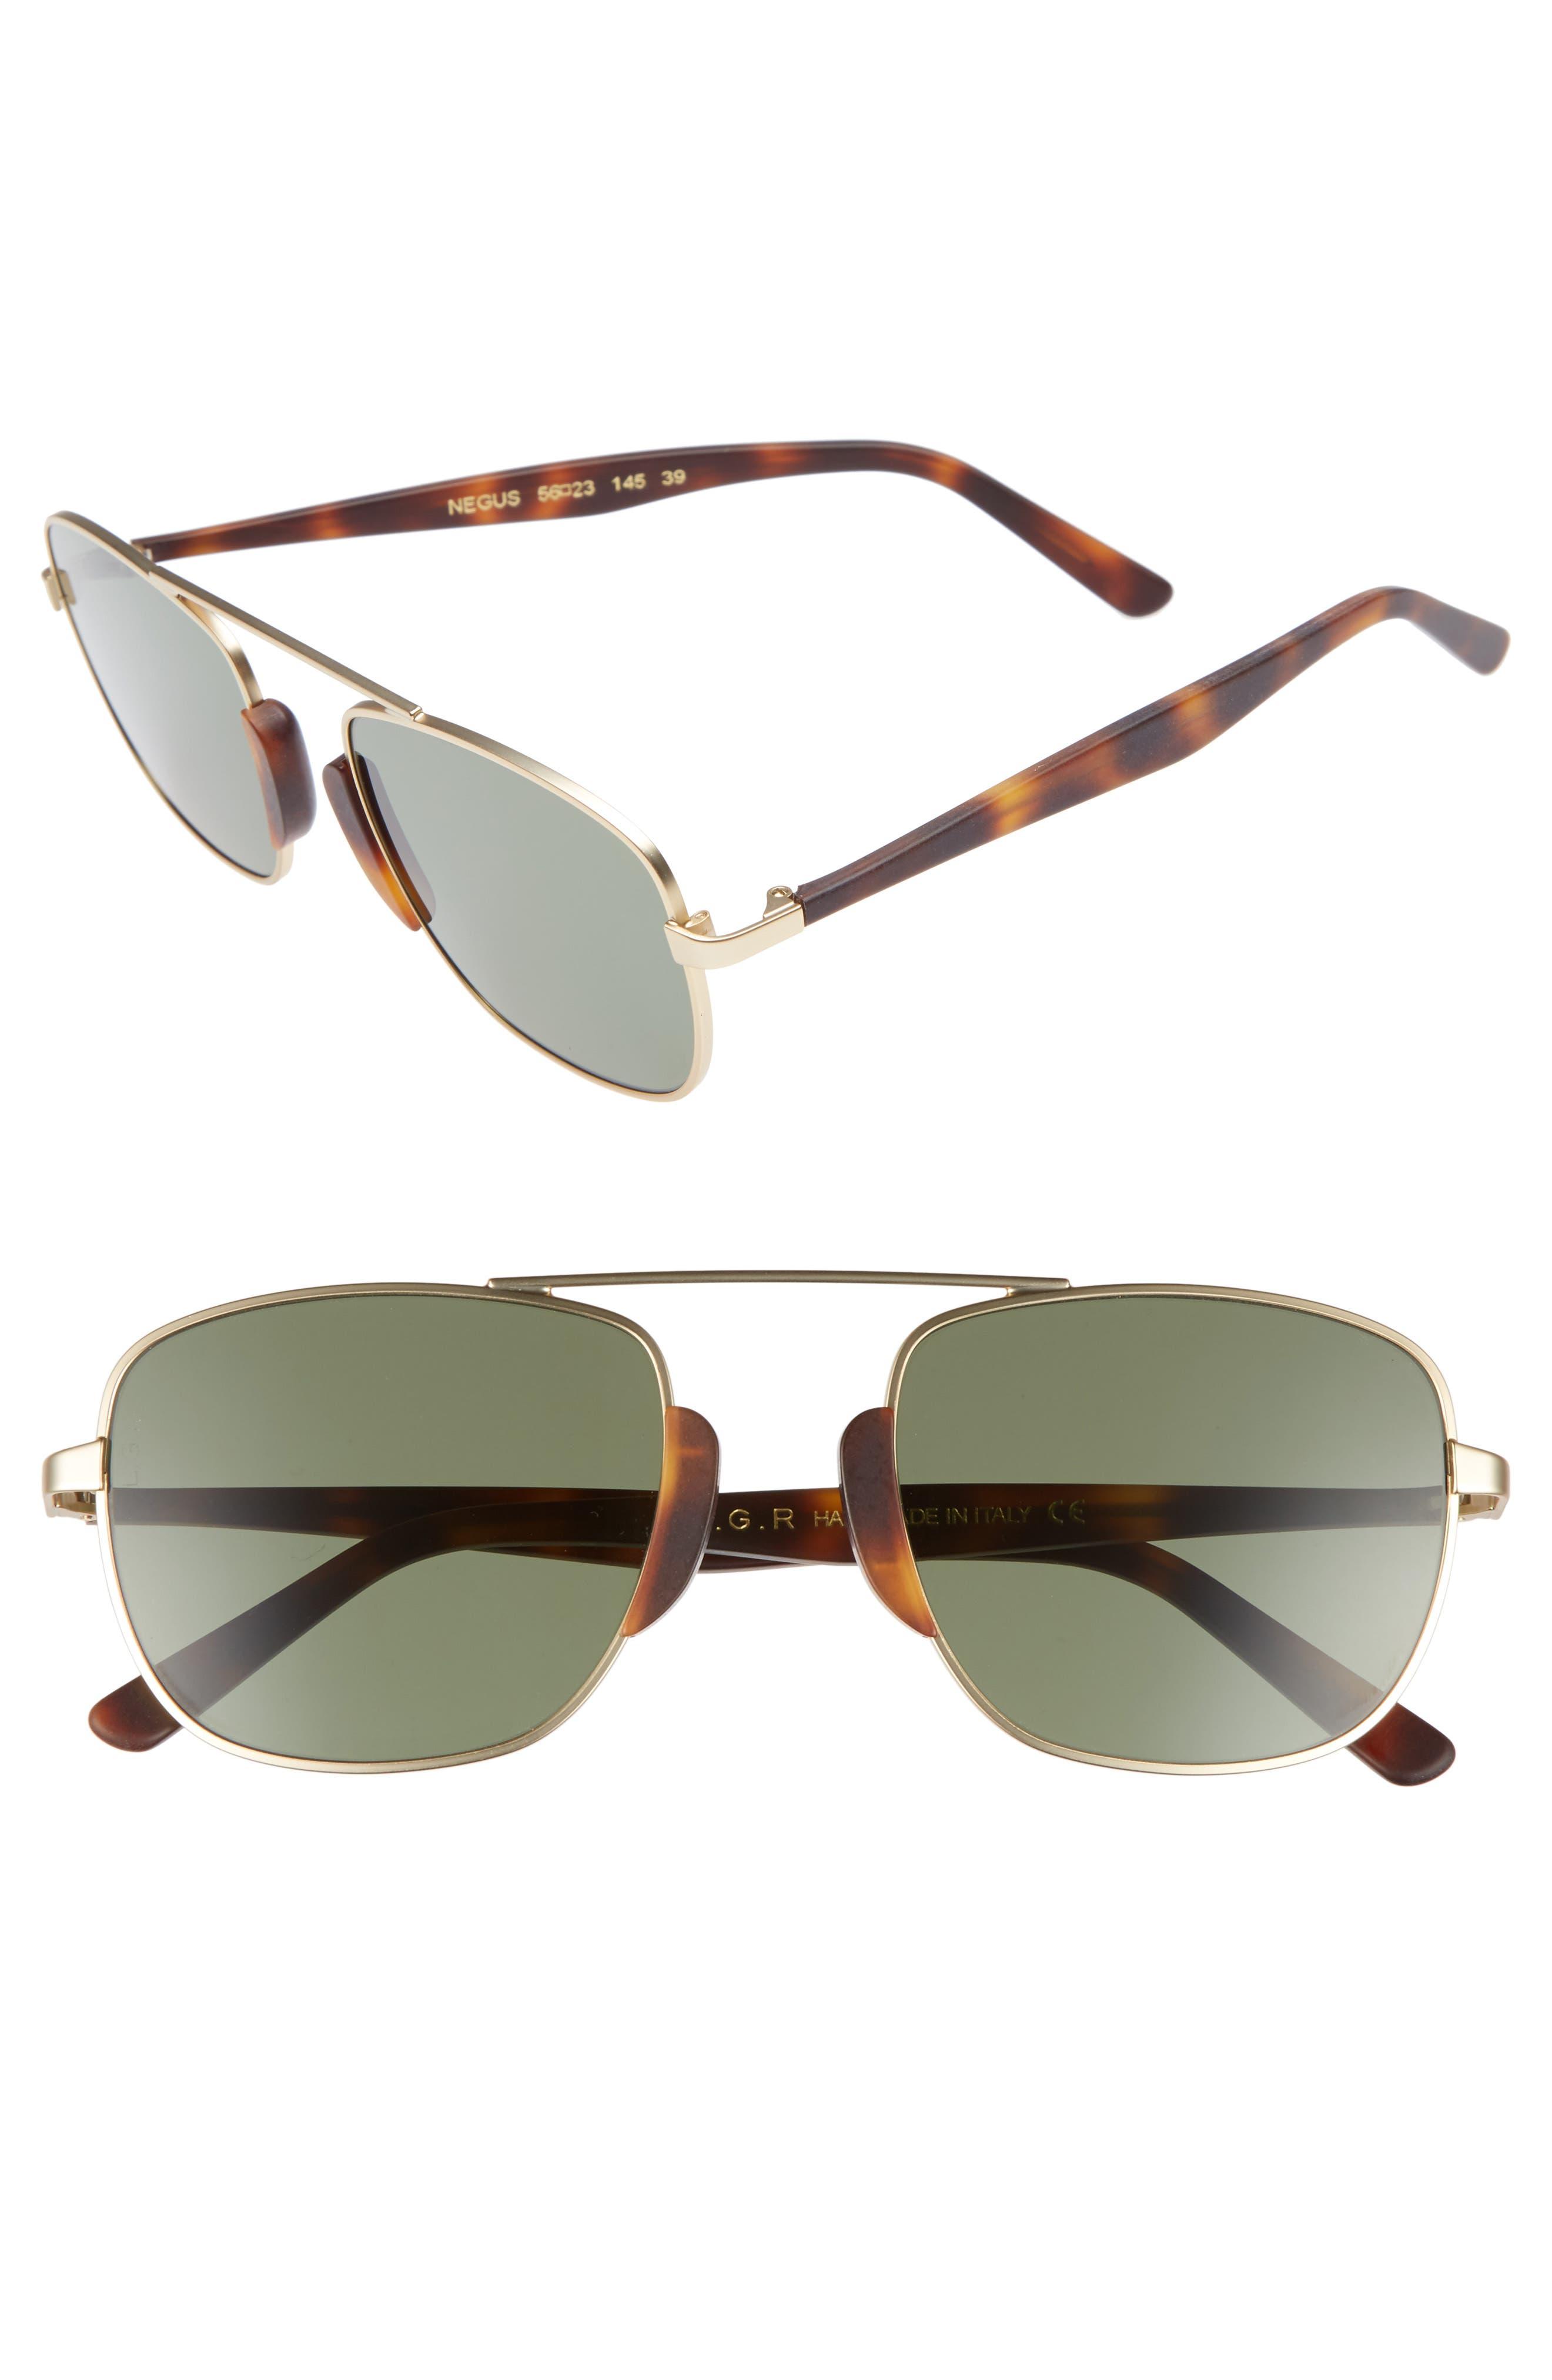 Main Image - L.G.R Negus 56mm Sunglasses